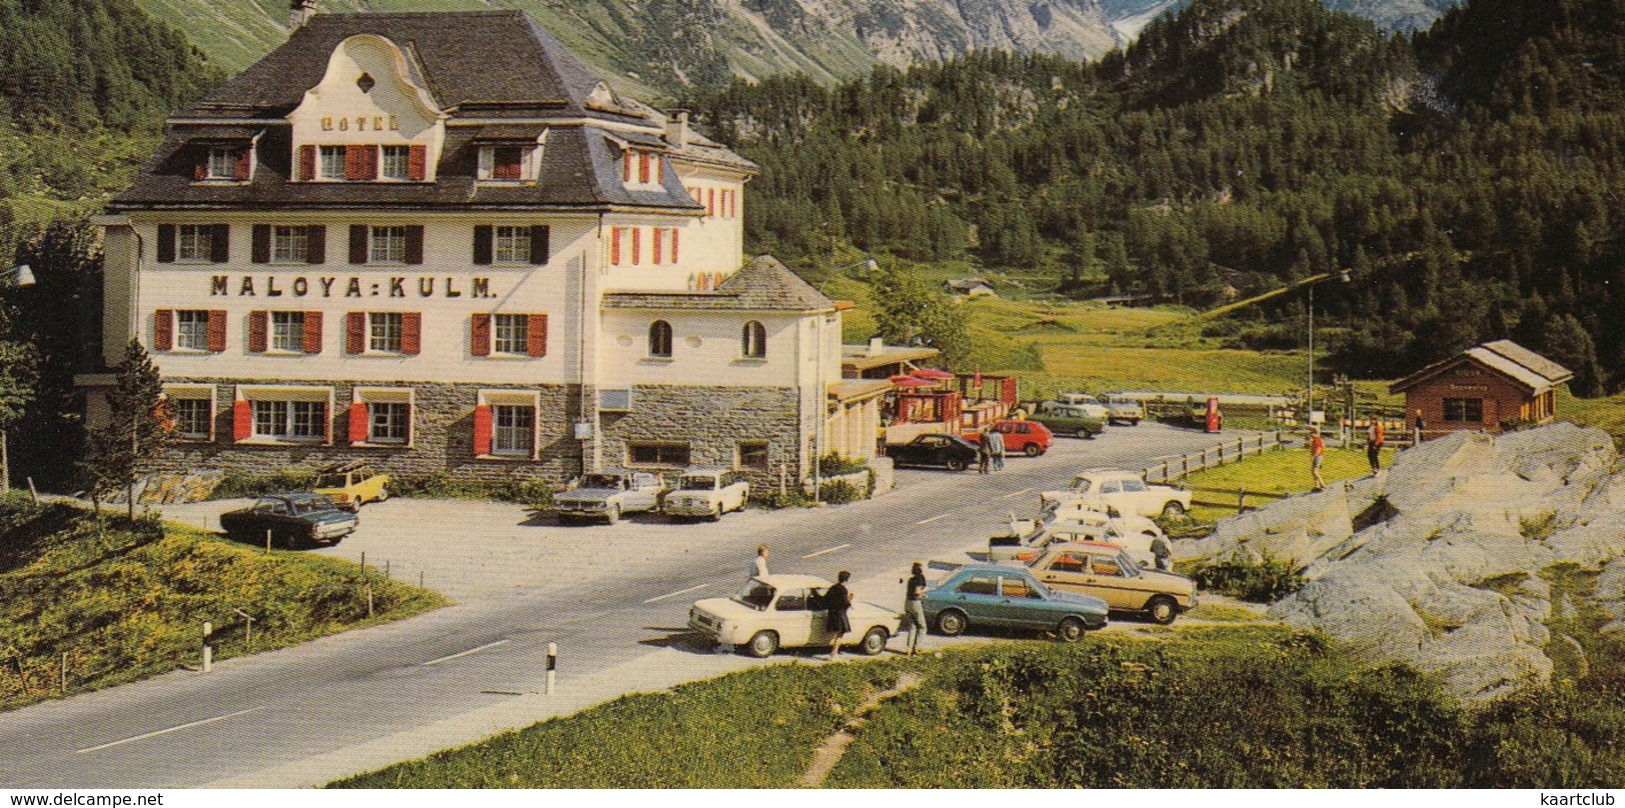 Maloja: BMW 1600-2, MERCEDES W114/15, PEUGEOT 404, VW 1200 & GOLF, FORD P5, LANCIA FULVIA - Hotel Maloya Kulm  - (CH) - Passenger Cars